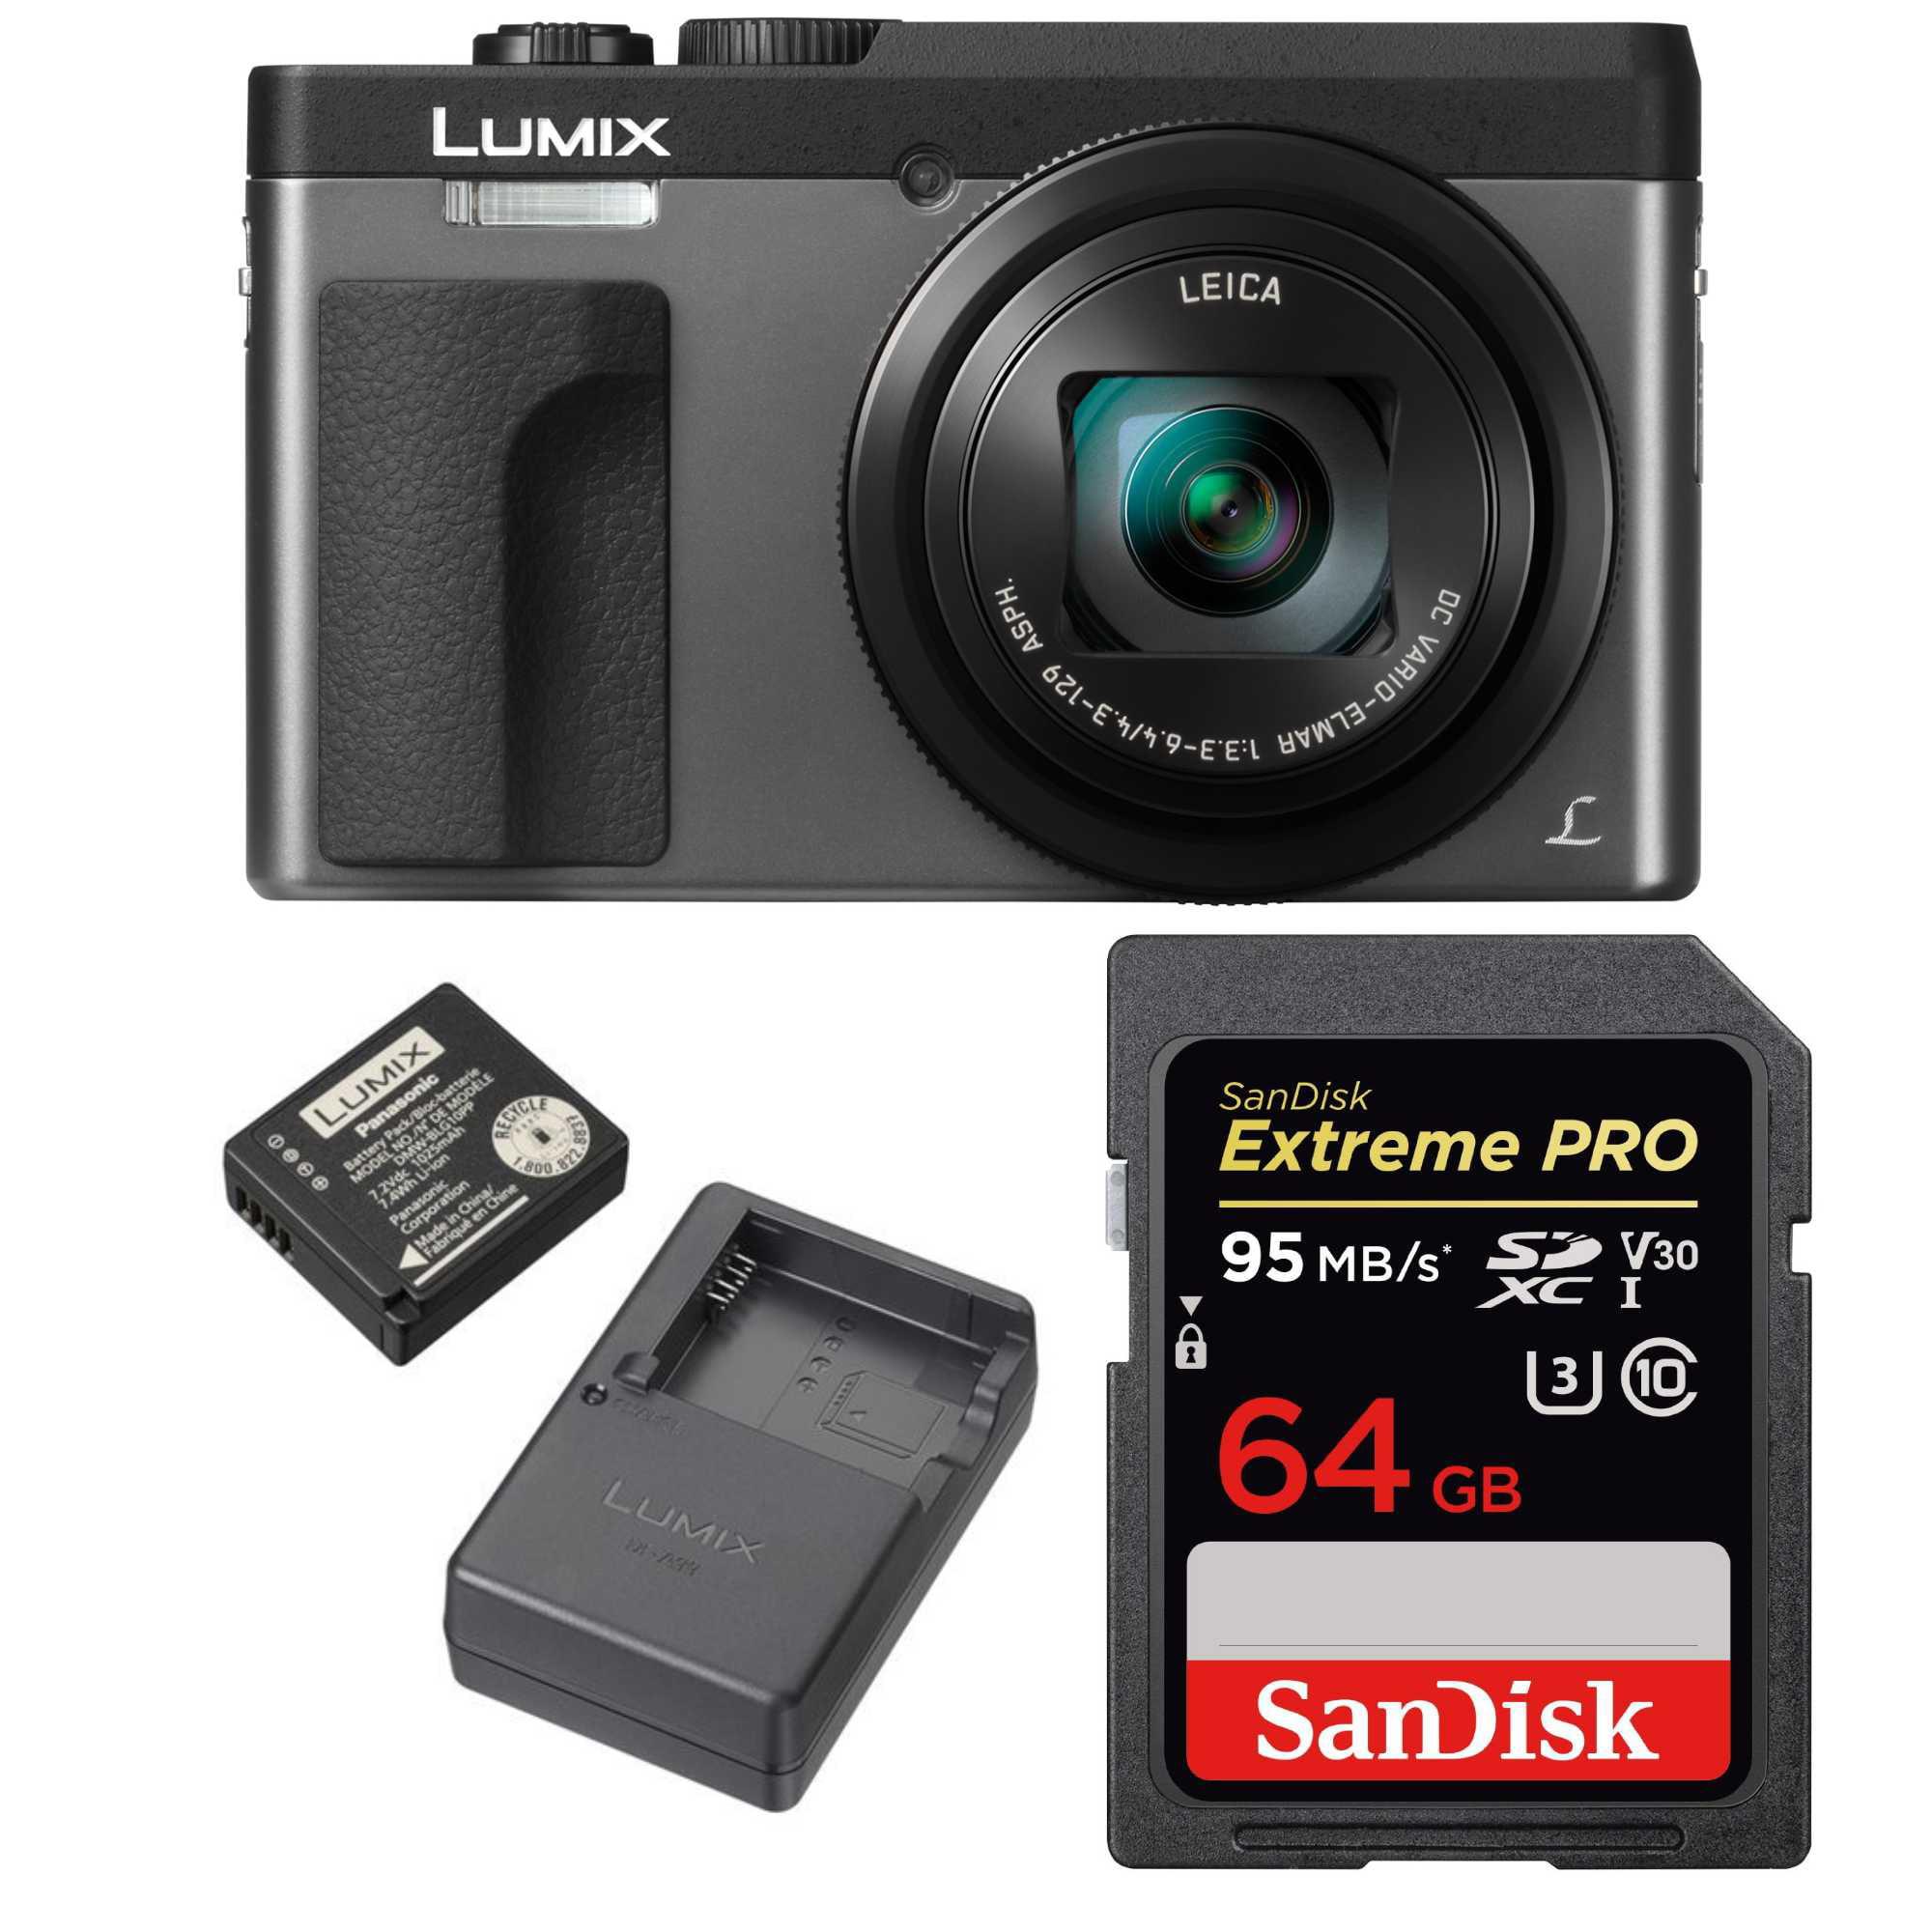 Panasonic Lumix DMC-ZS70S 20.3 Digital Camera (Silver) w/ Travel Bundle